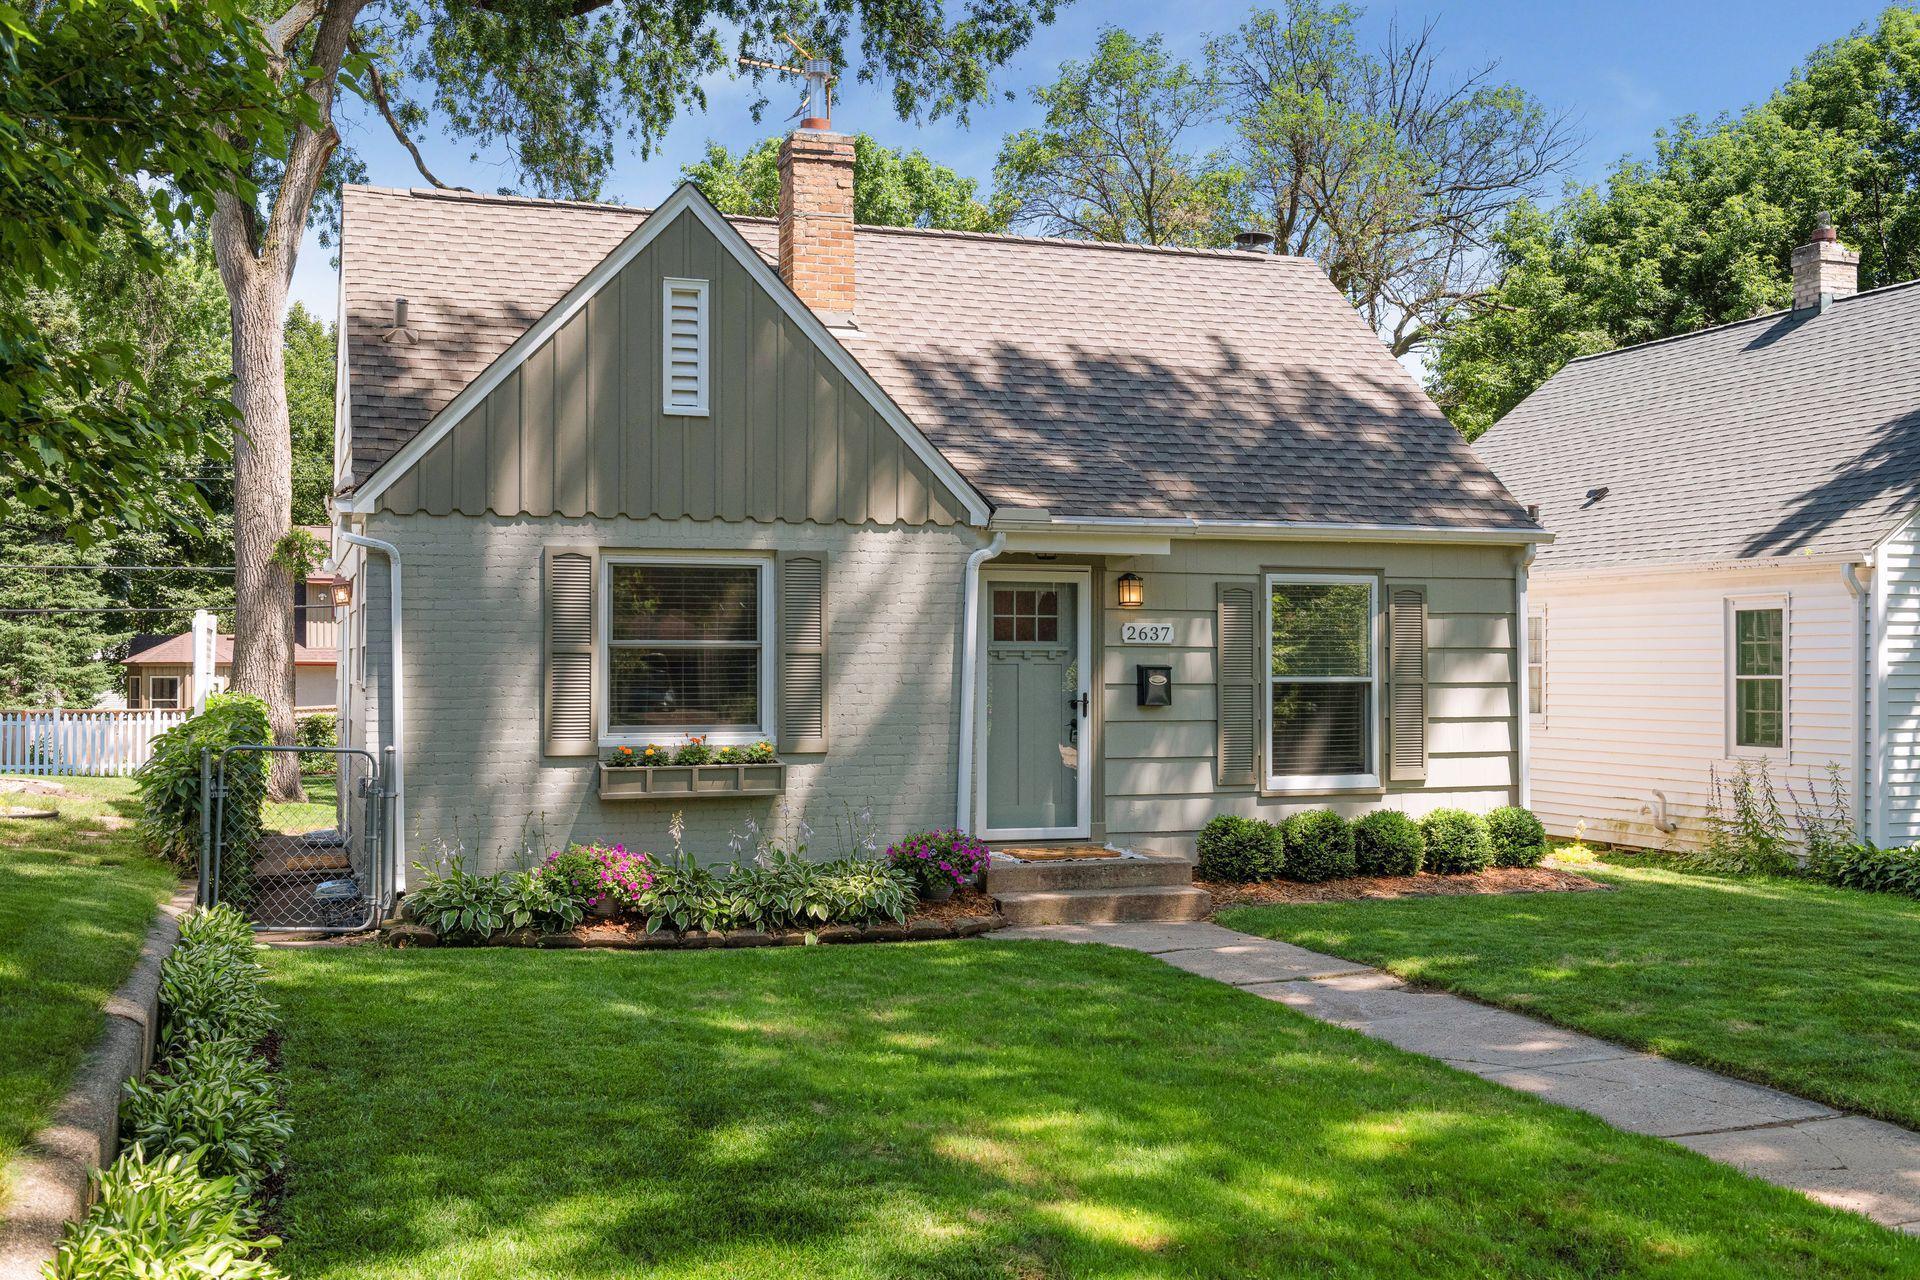 2637 Xenwood S Property Photo - Saint Louis Park, MN real estate listing